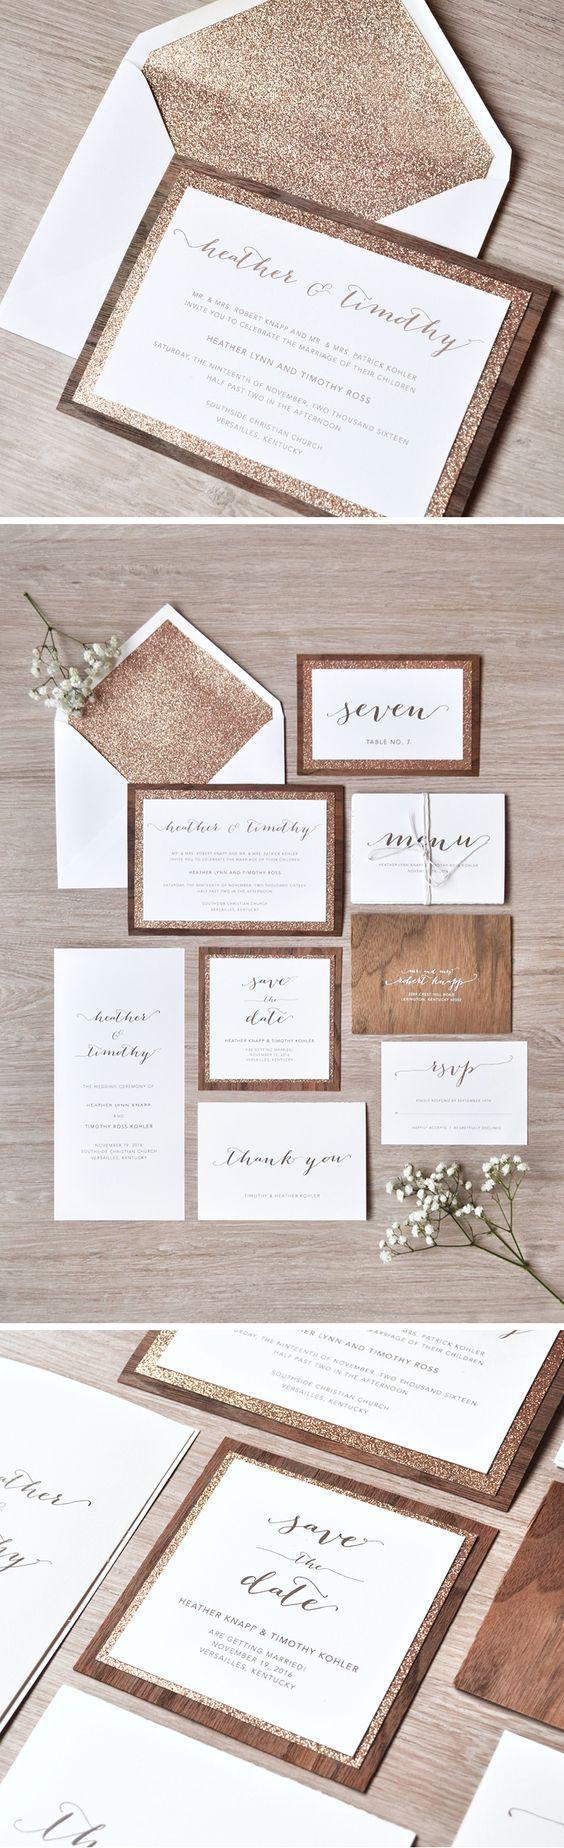 nautical wedding invitations uk%0A Rustic Wedding Invitation  Heather Wedding Invitation